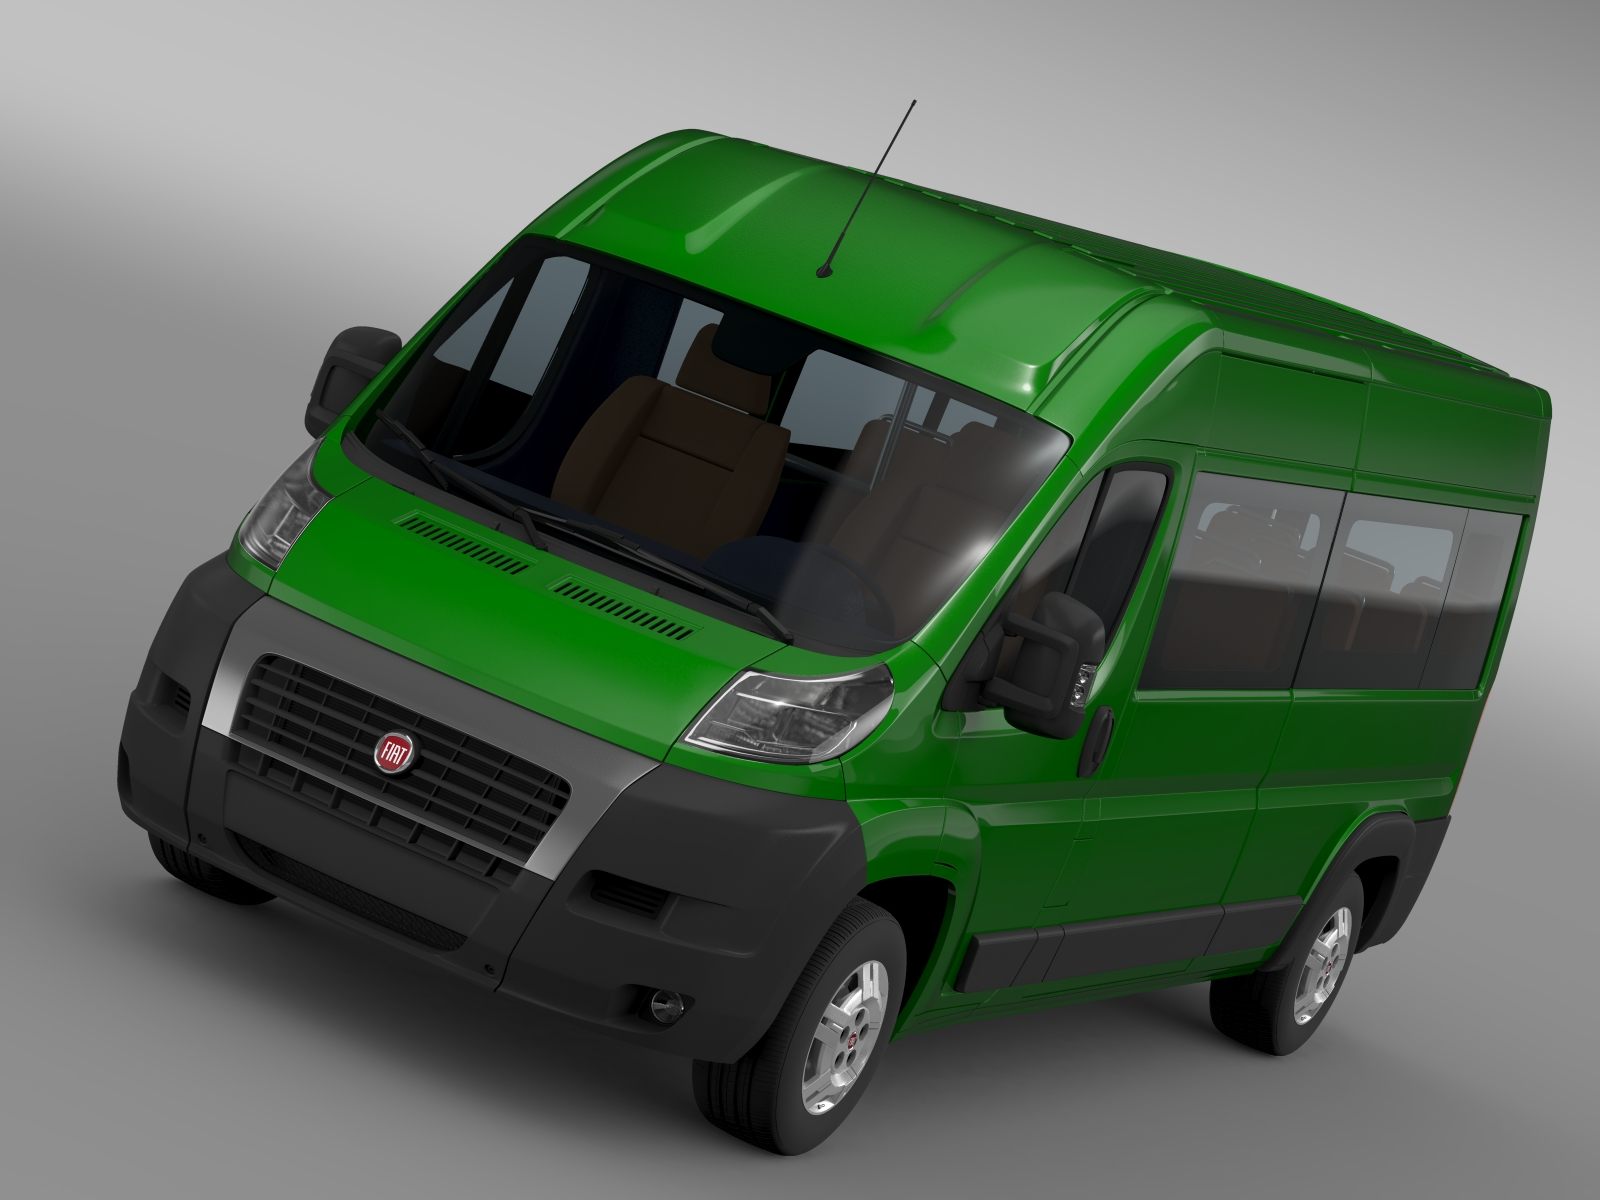 fiat ducato maxi bus l4h2 2006-2014 3d model 3ds maks fbx c4d lwo ma mb hrc xsi obj 210324